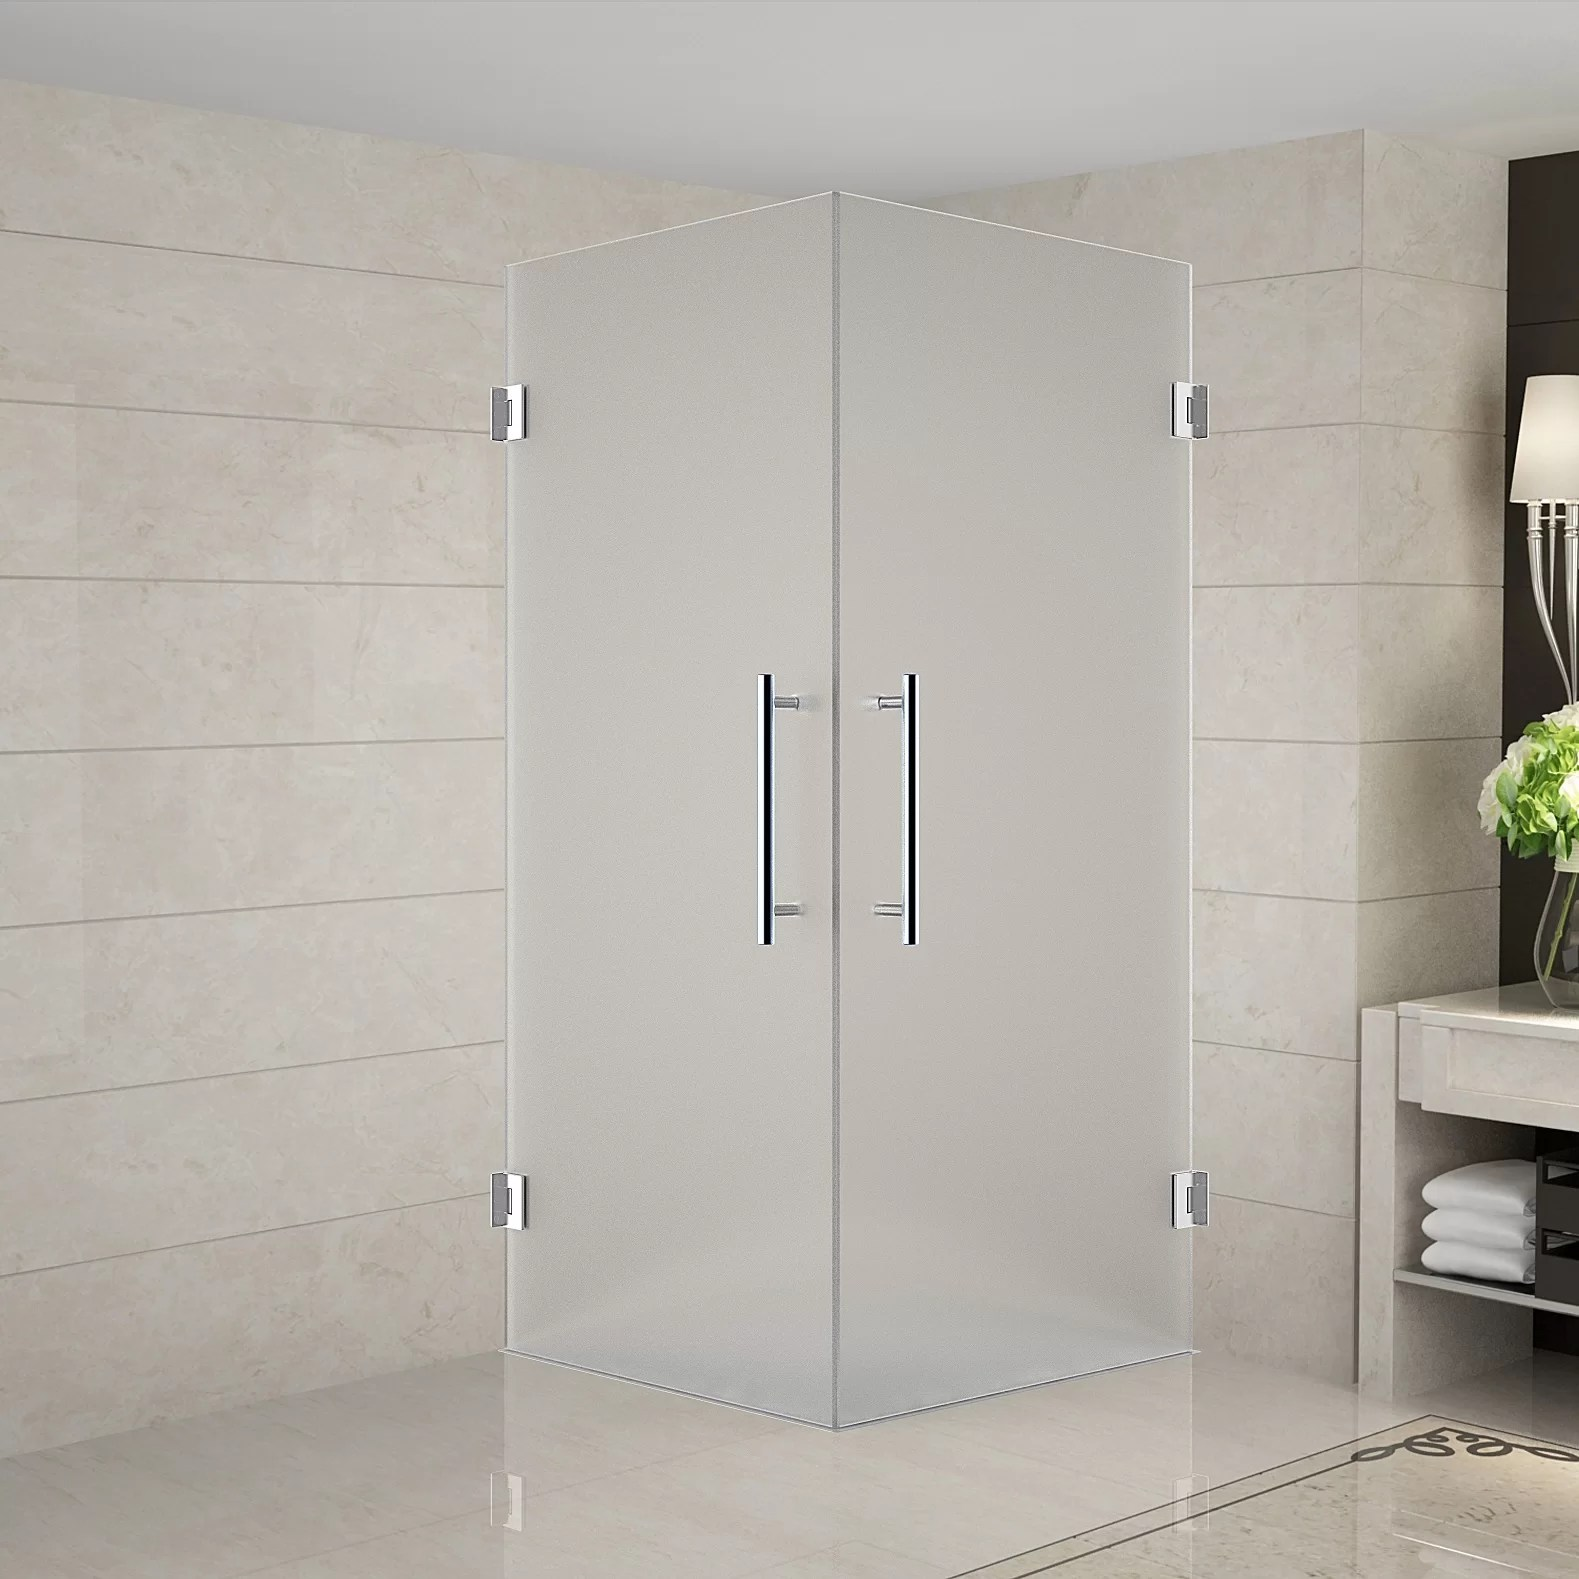 Vanora 32 X 72 Square Hinged Shower Enclosure